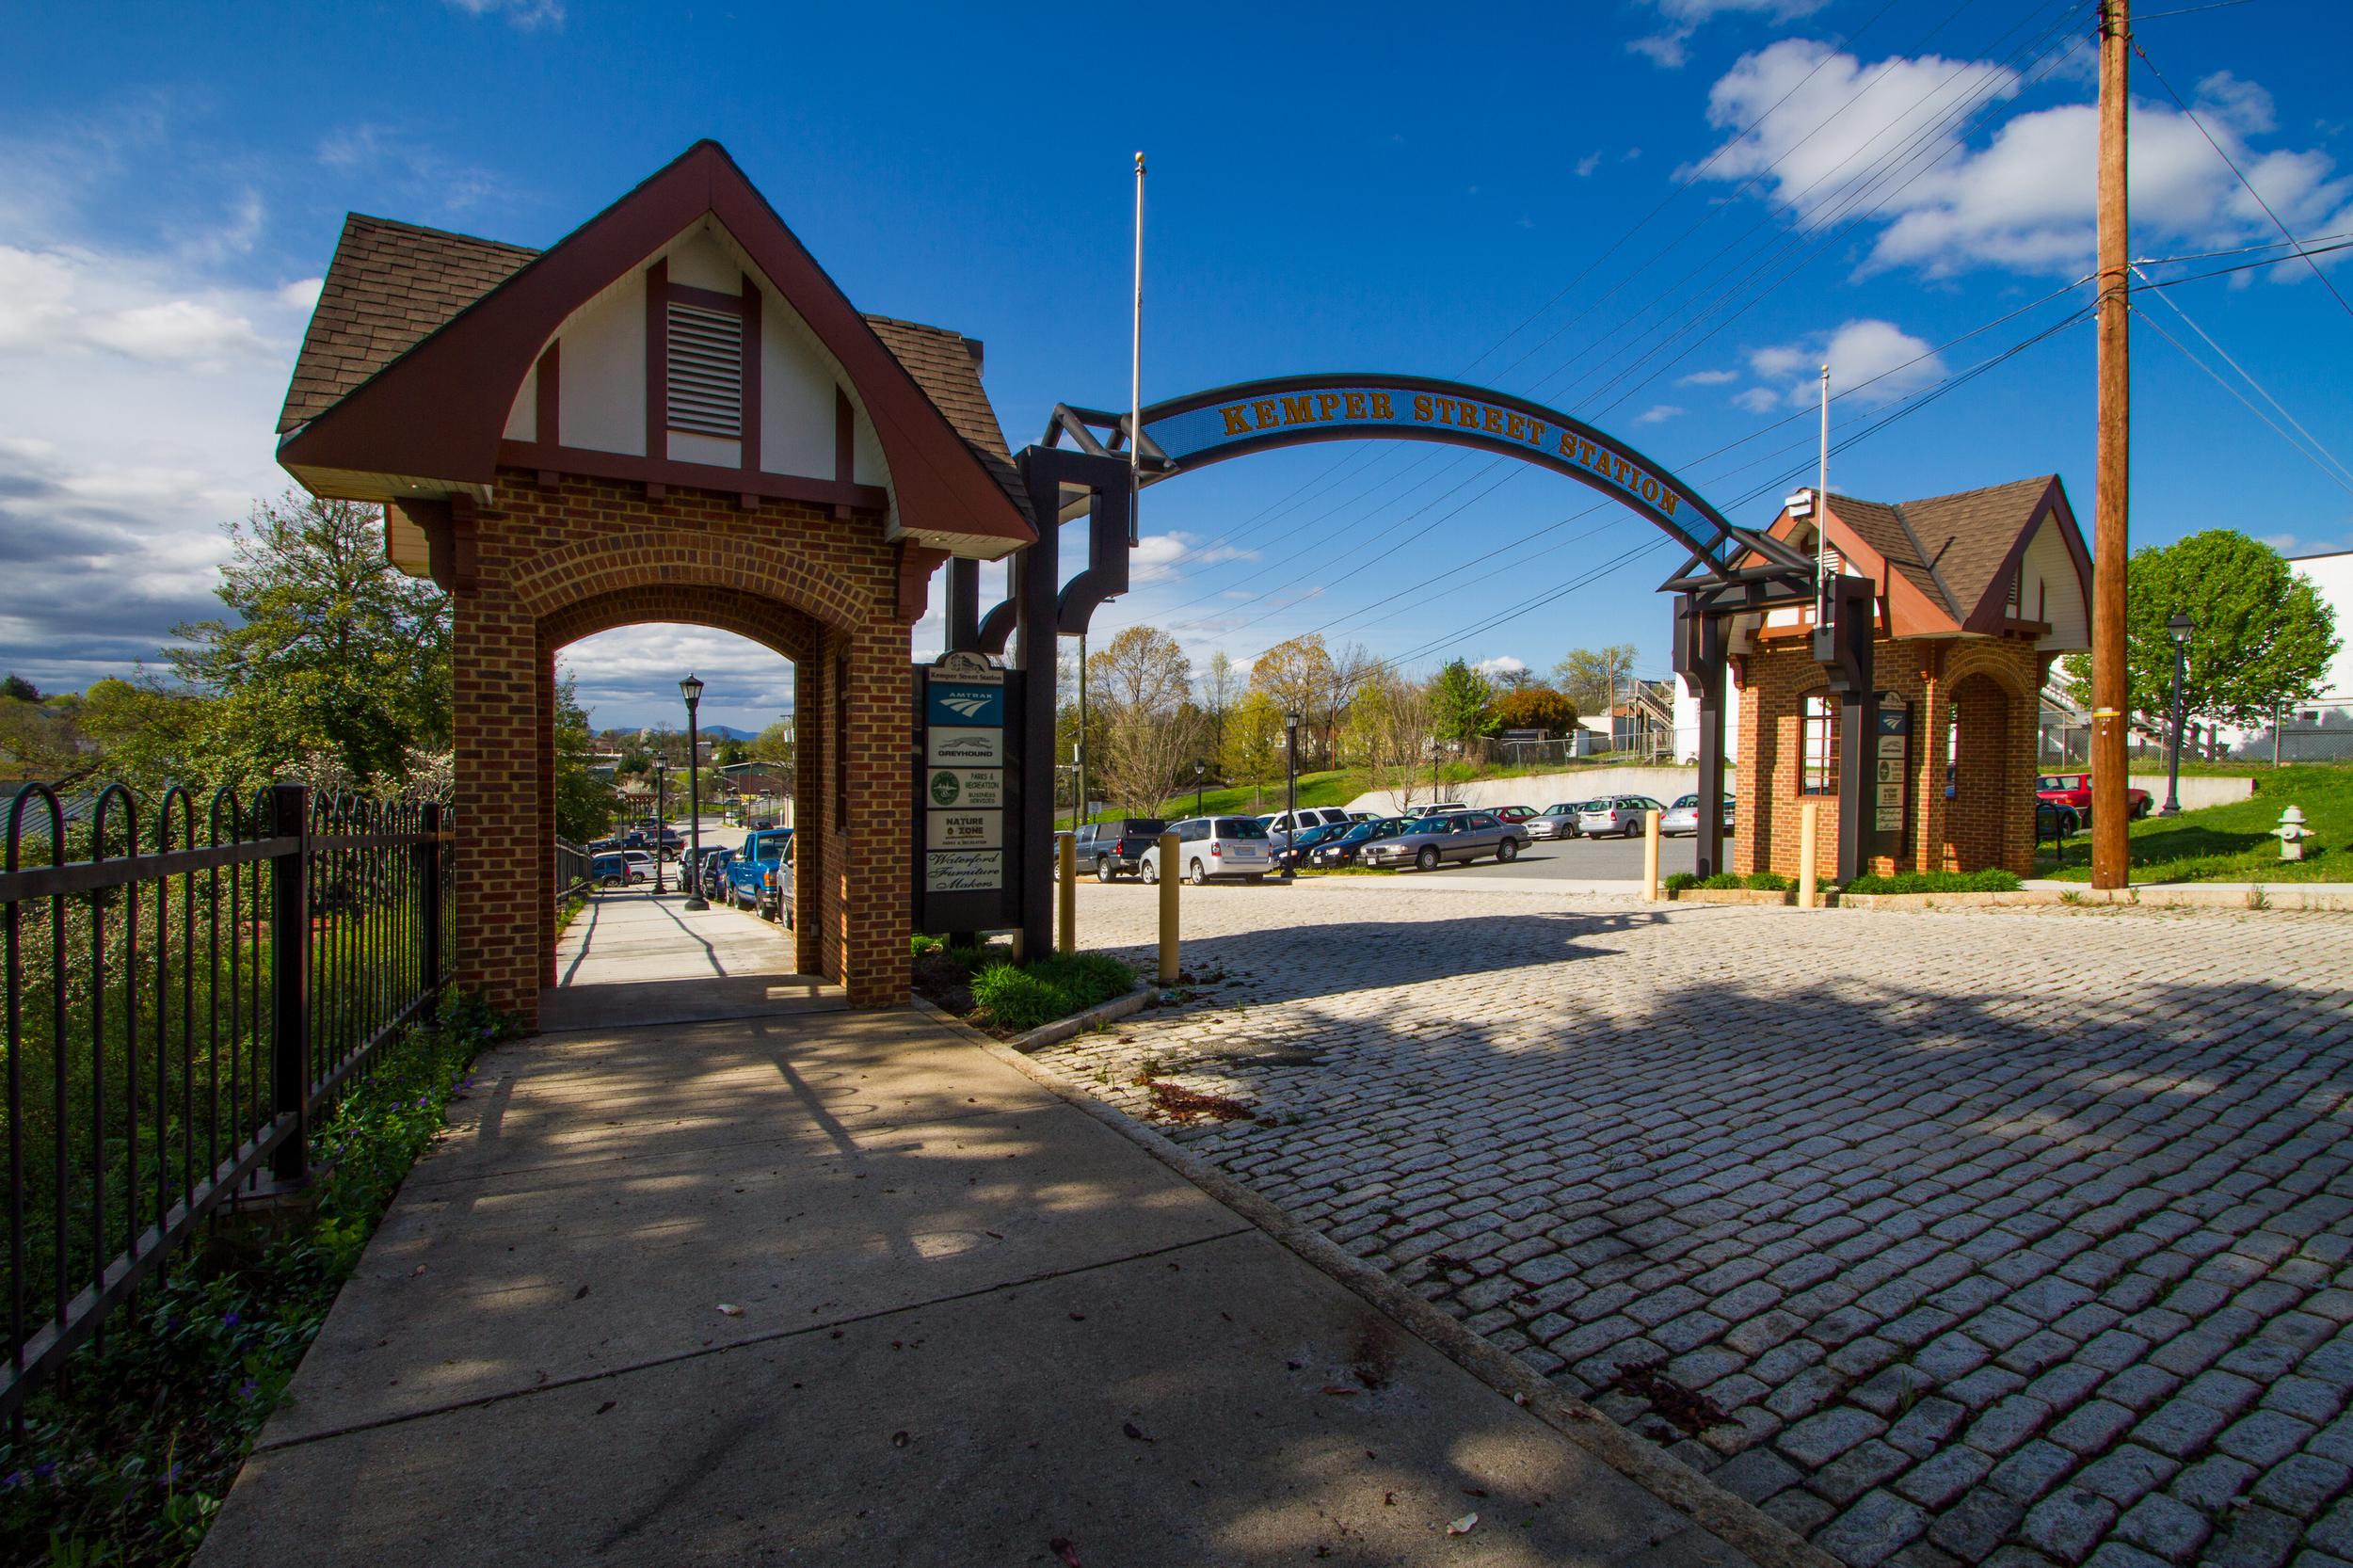 KEMPER STREET TRAIN STATION gateway -LYNCHBURG, VIRGINIA